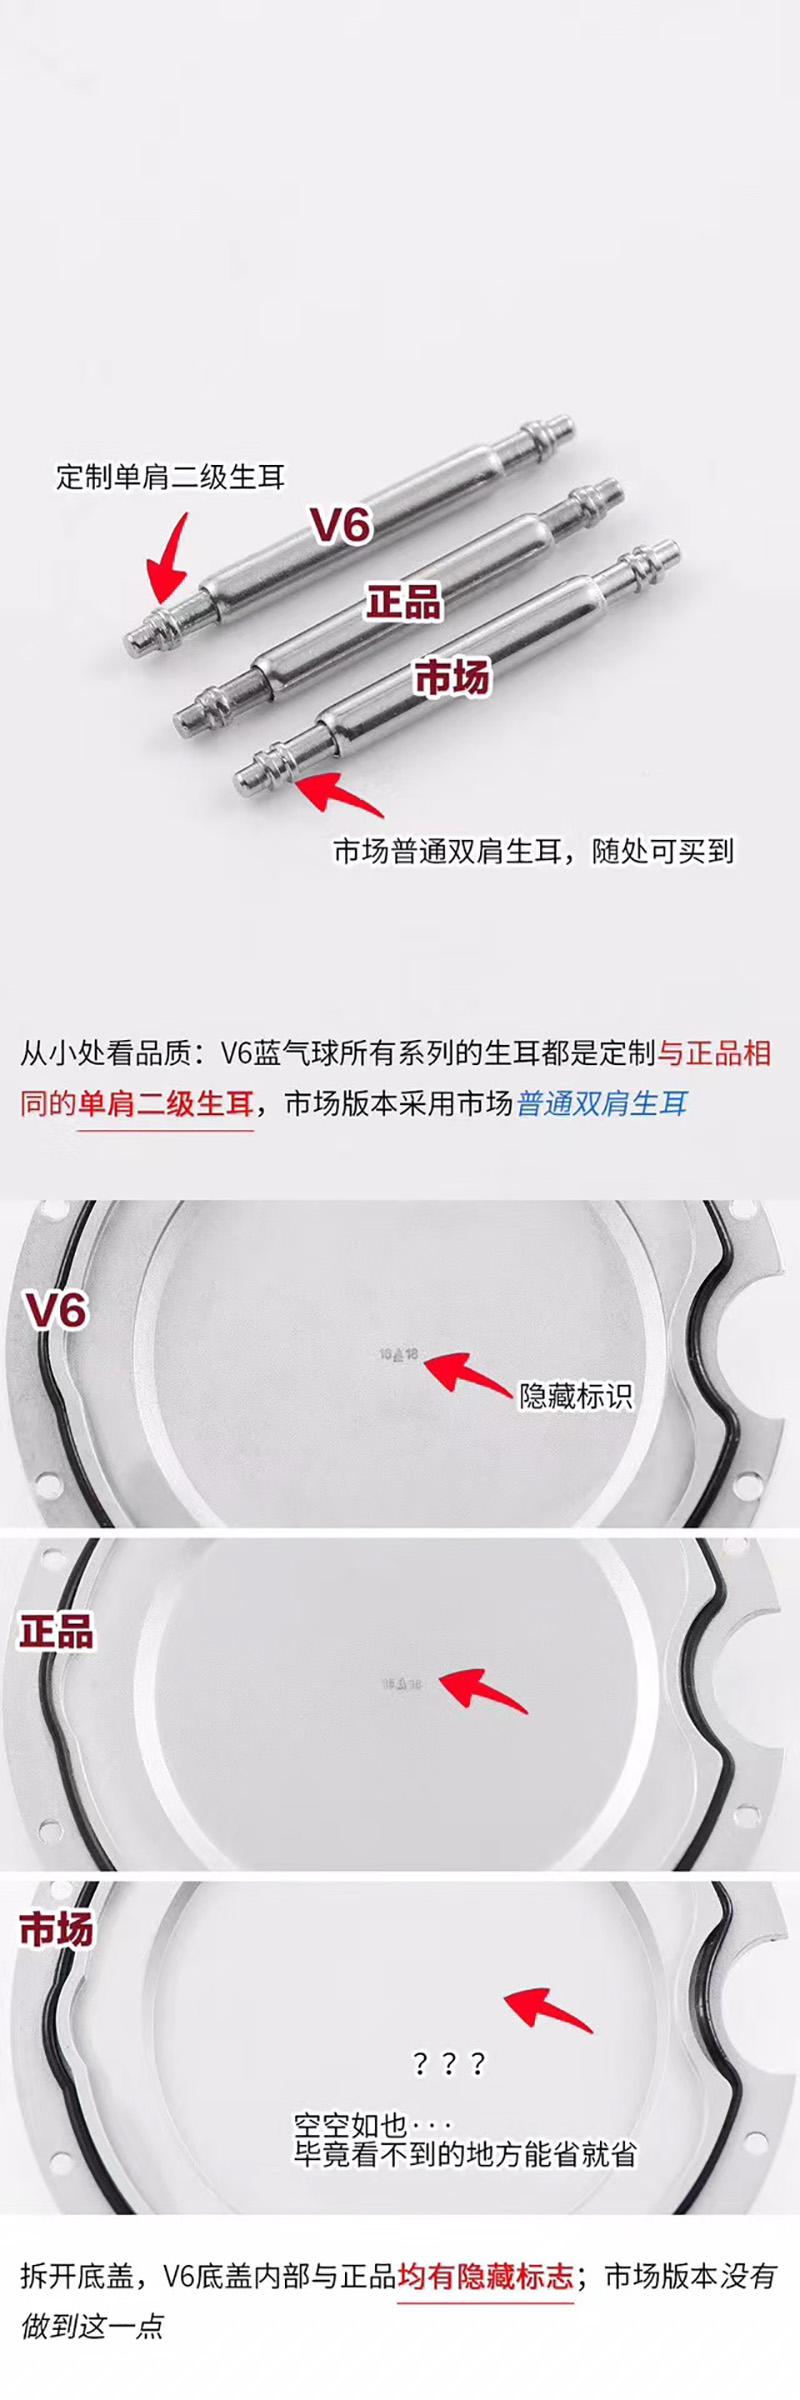 V7版蓝气球-V6厂蓝气球V7版对比正品  第7张